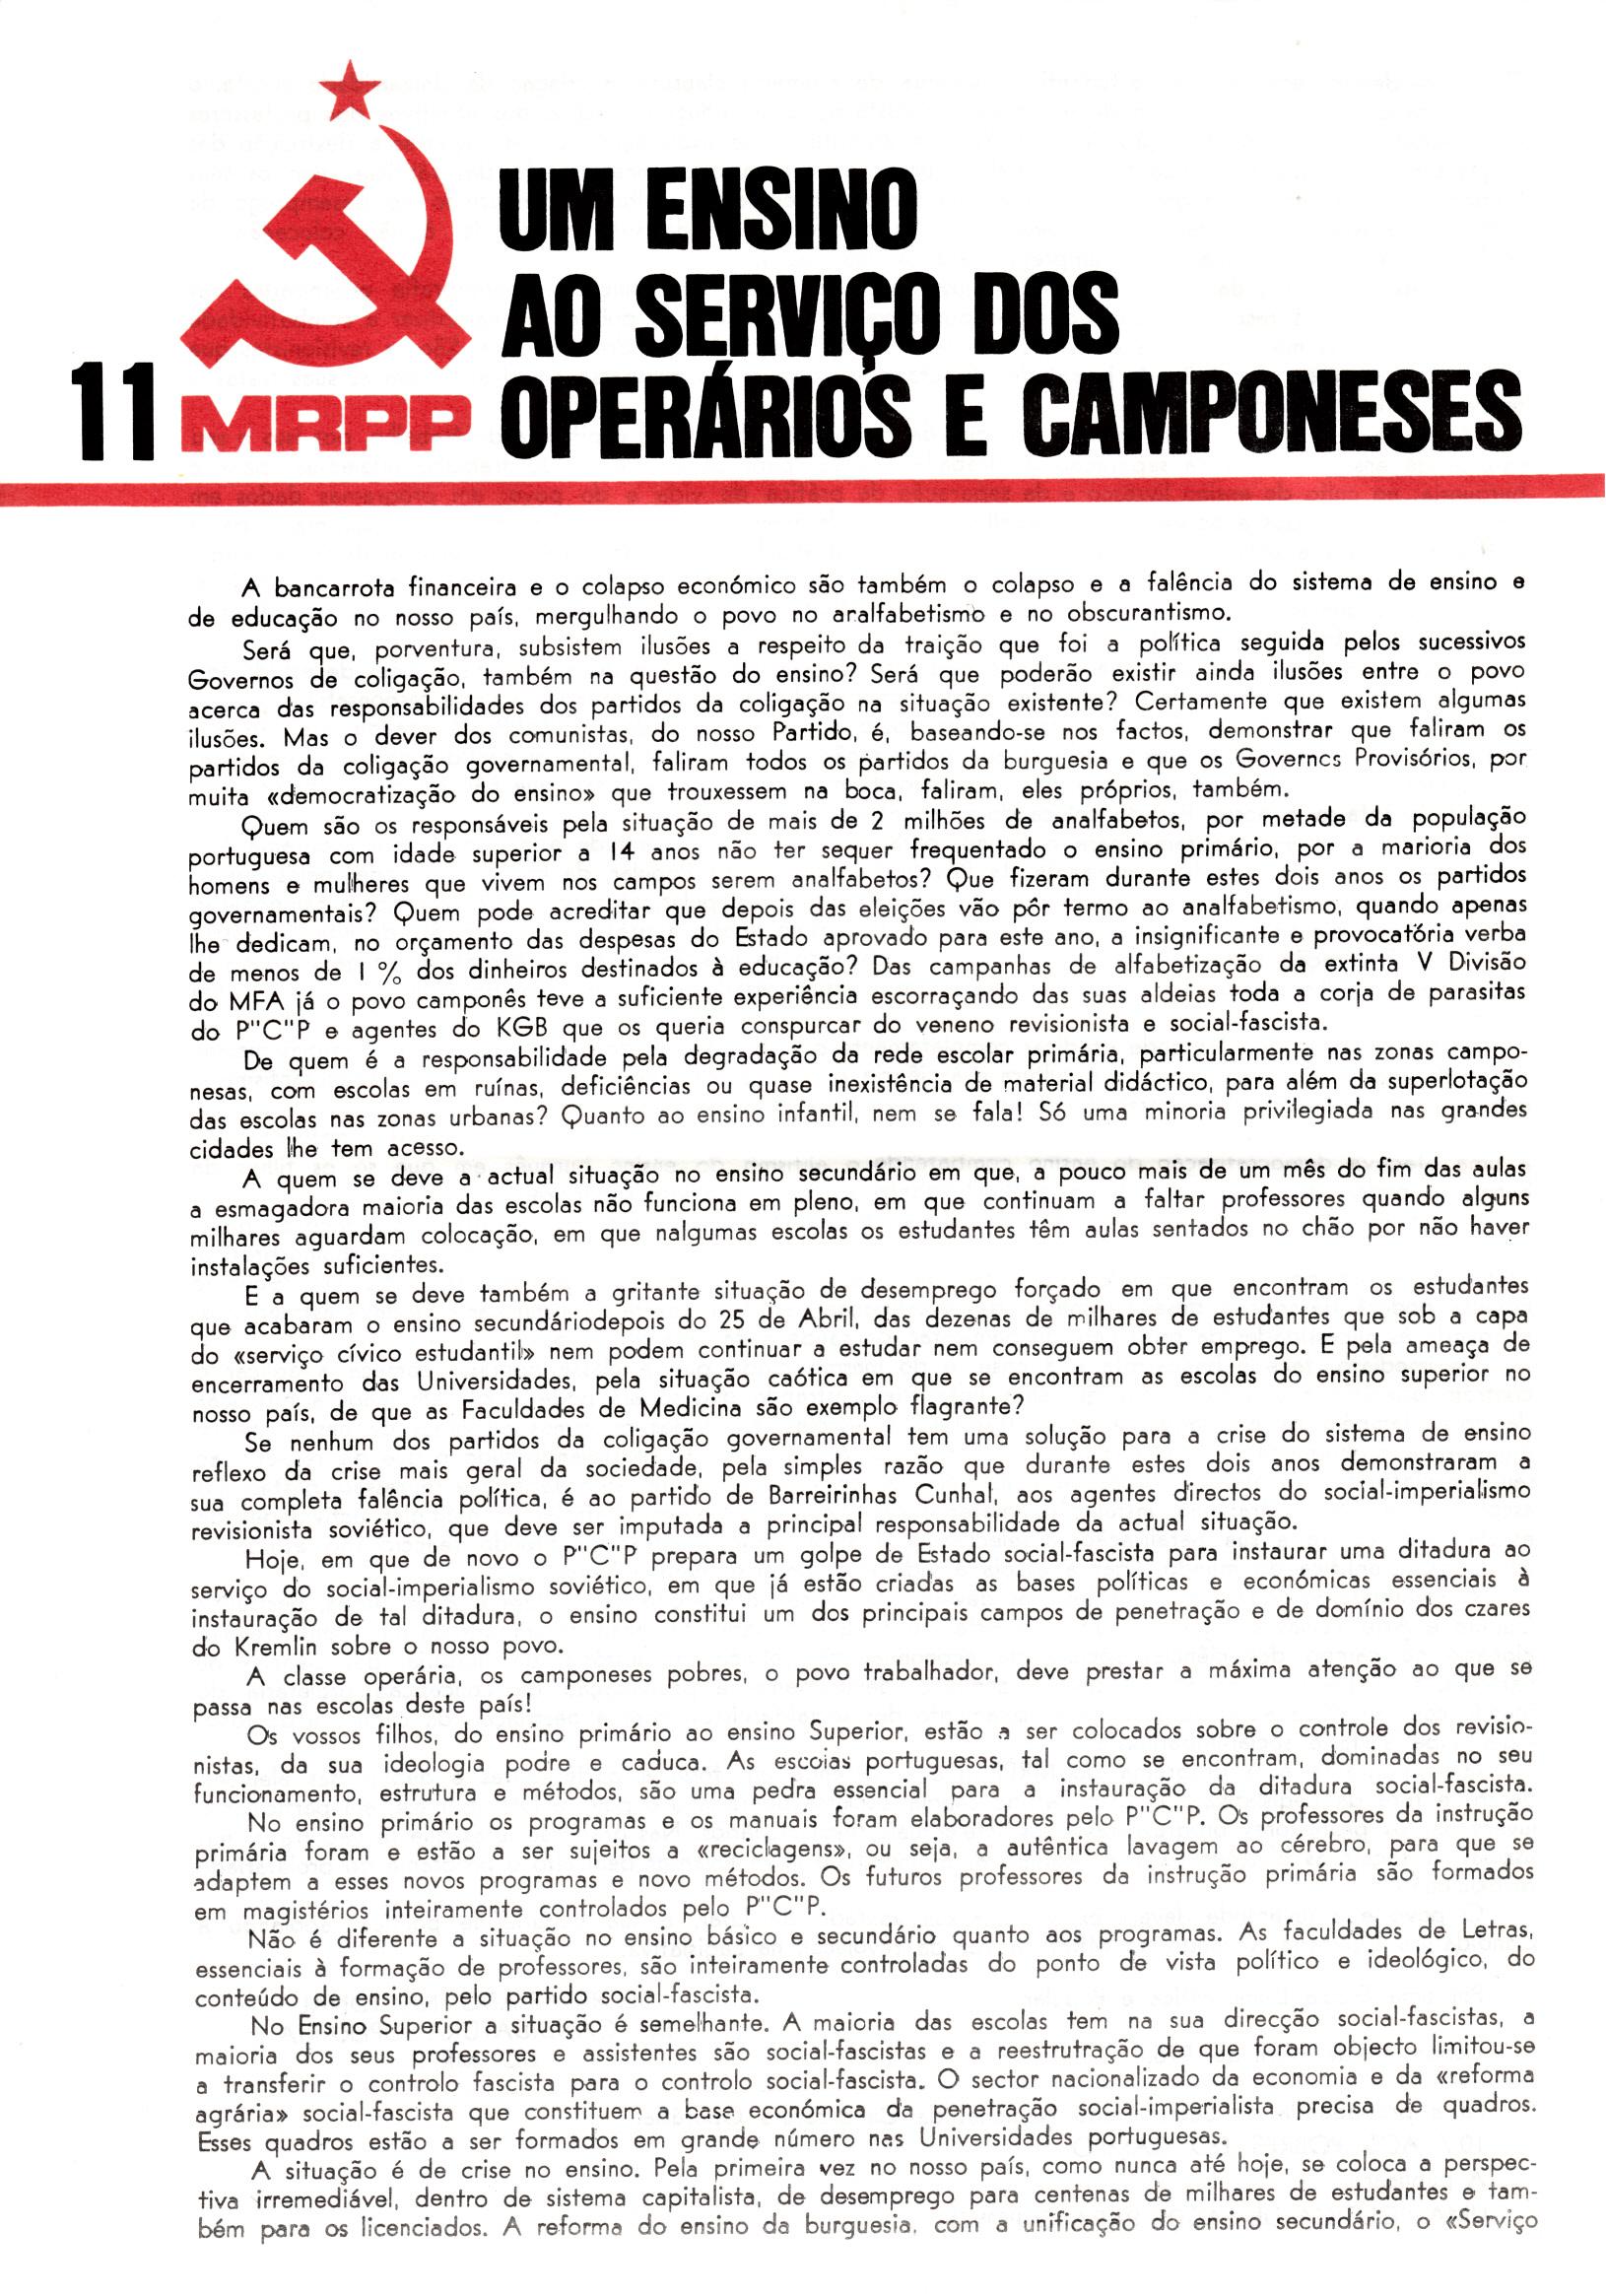 mrpp_1976_eleicao_programa_0021